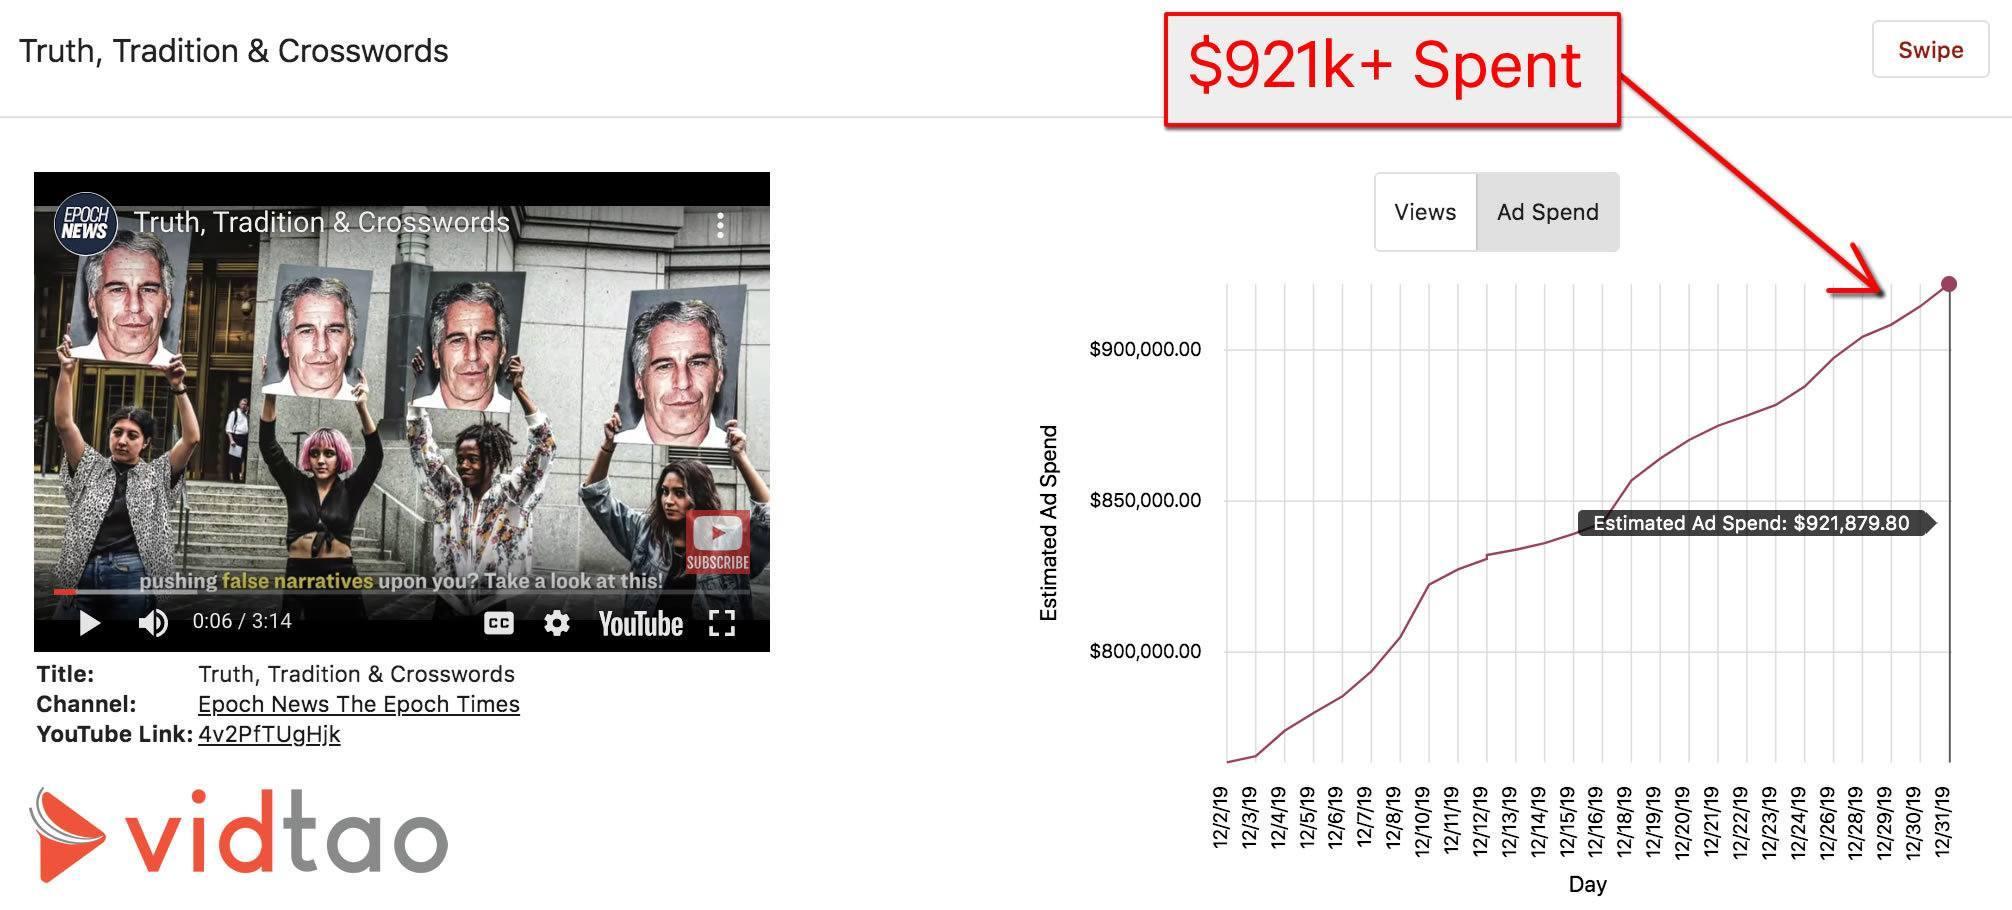 youtube-ad-spy-tool-screenshot-epoch-epstein-screenshot-20200101-1